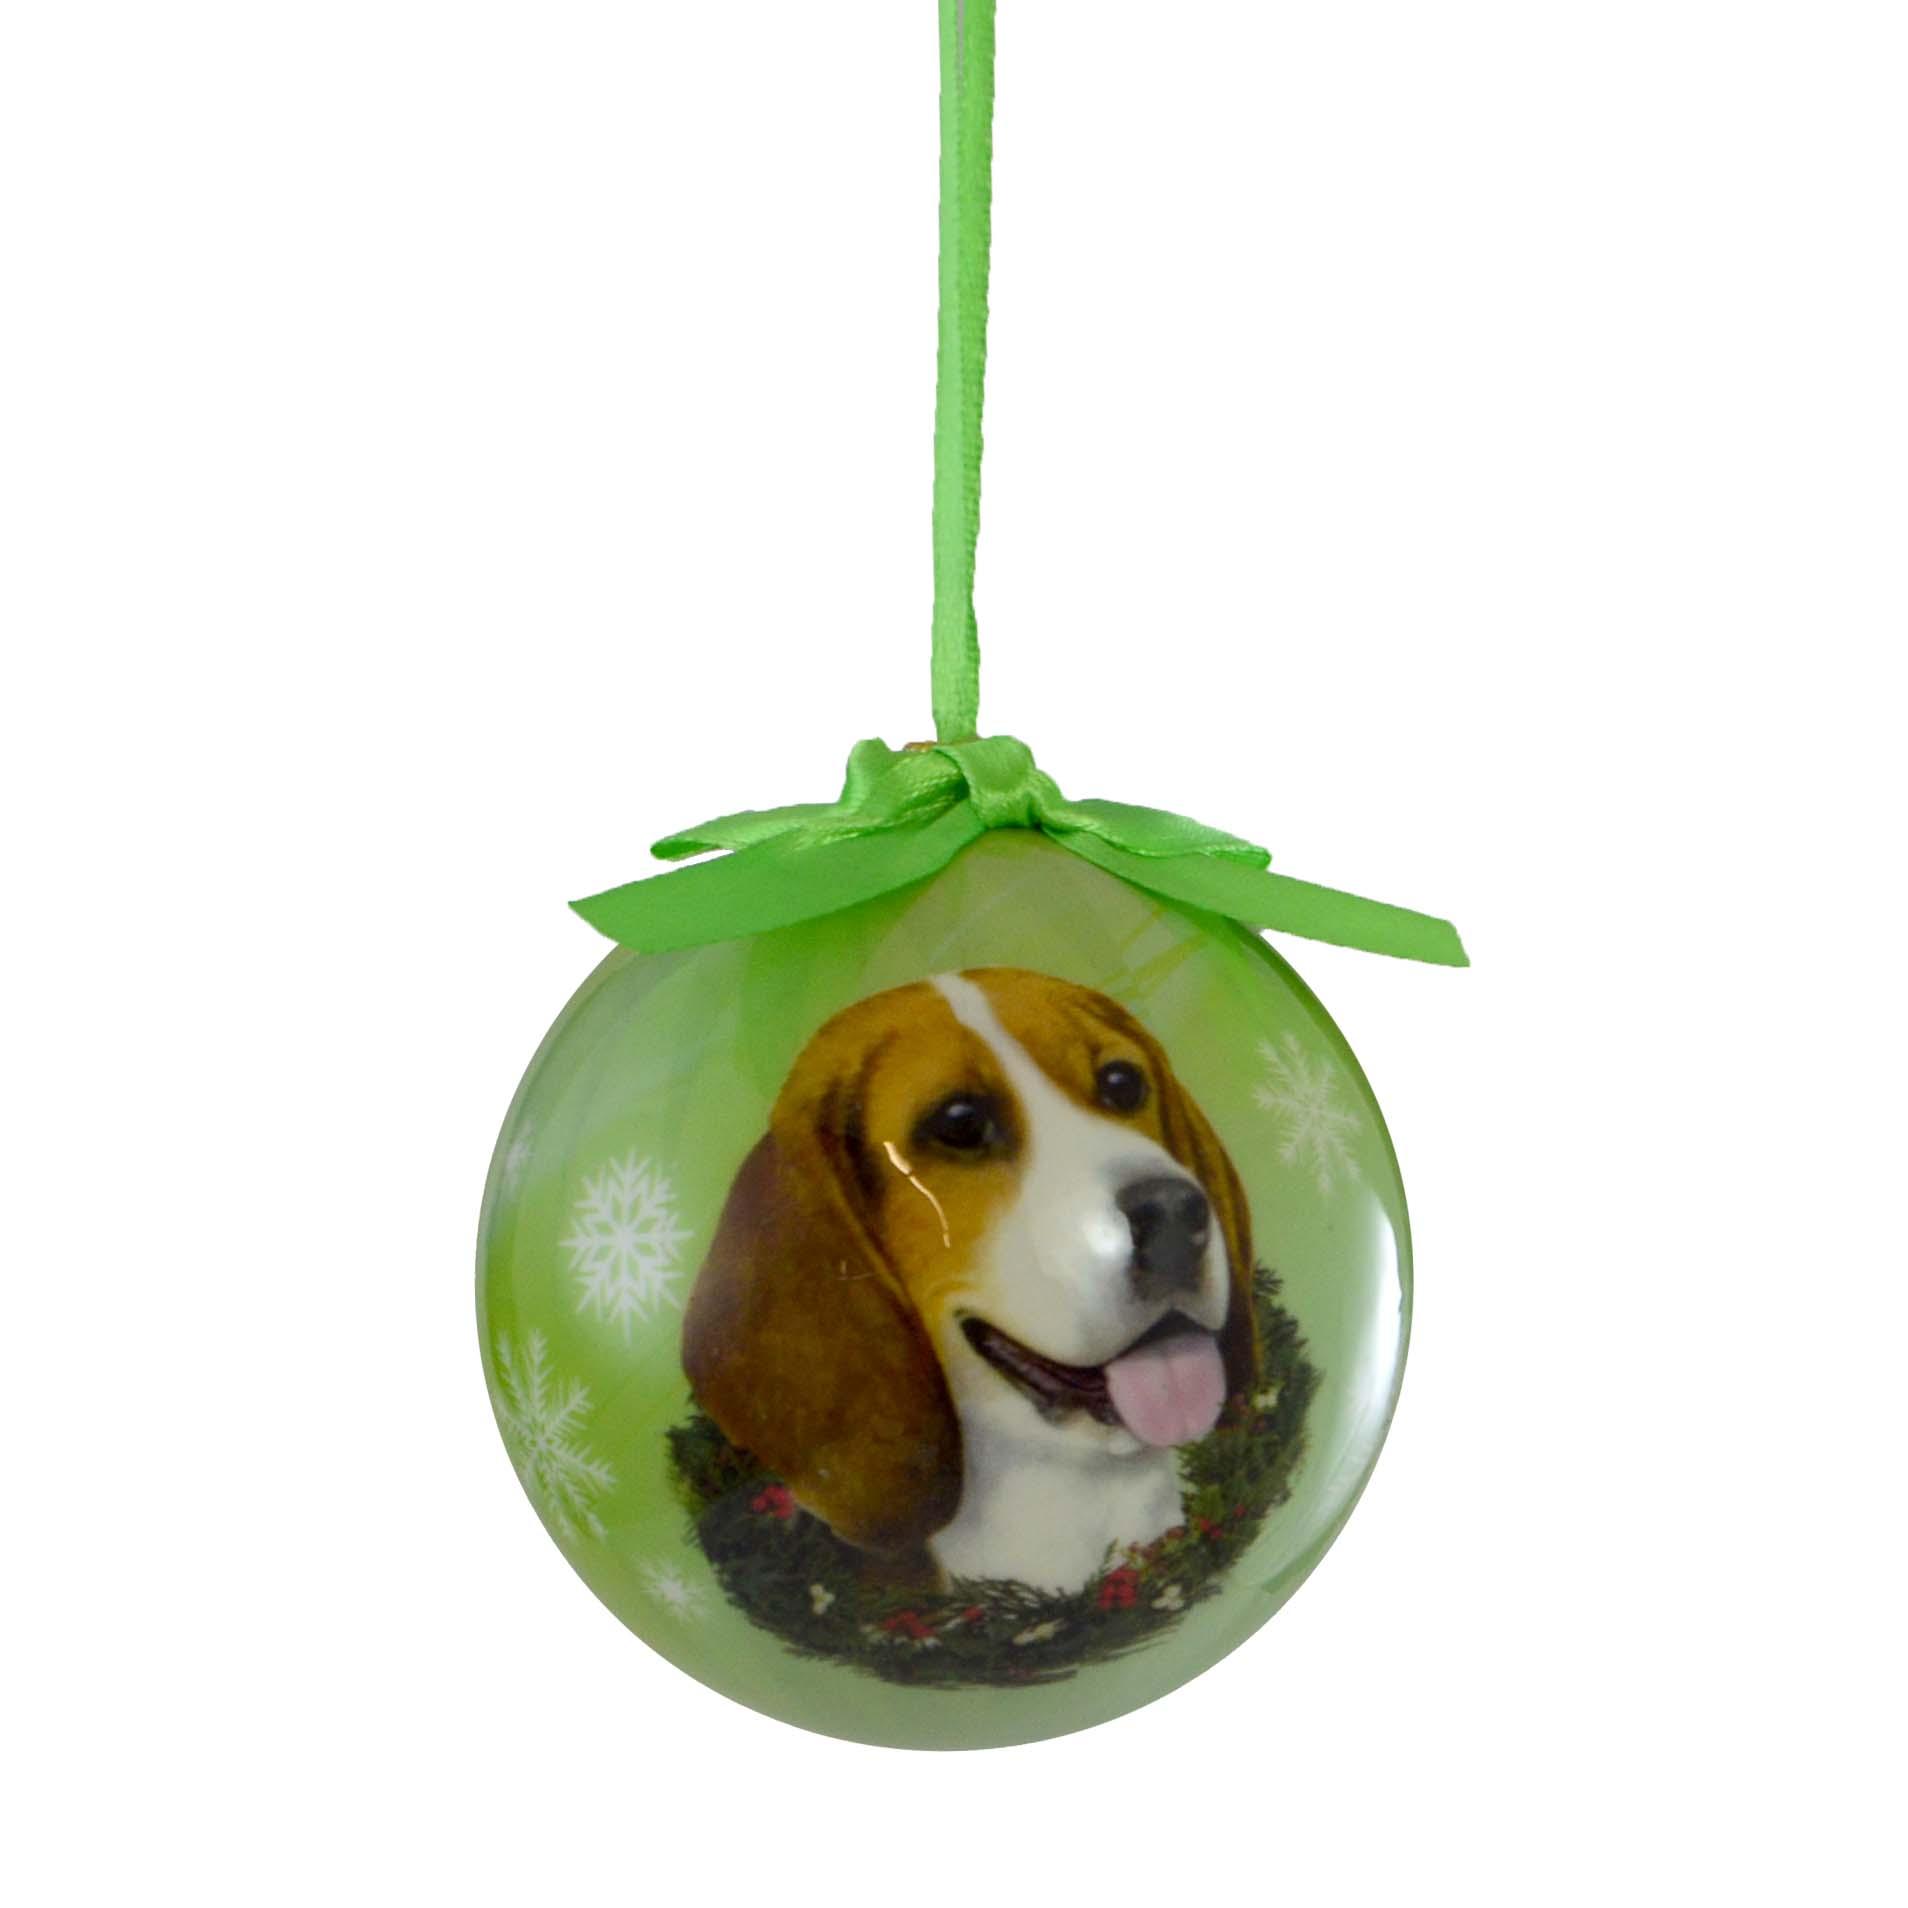 Novelty ornaments - Beagle Ball Ornament